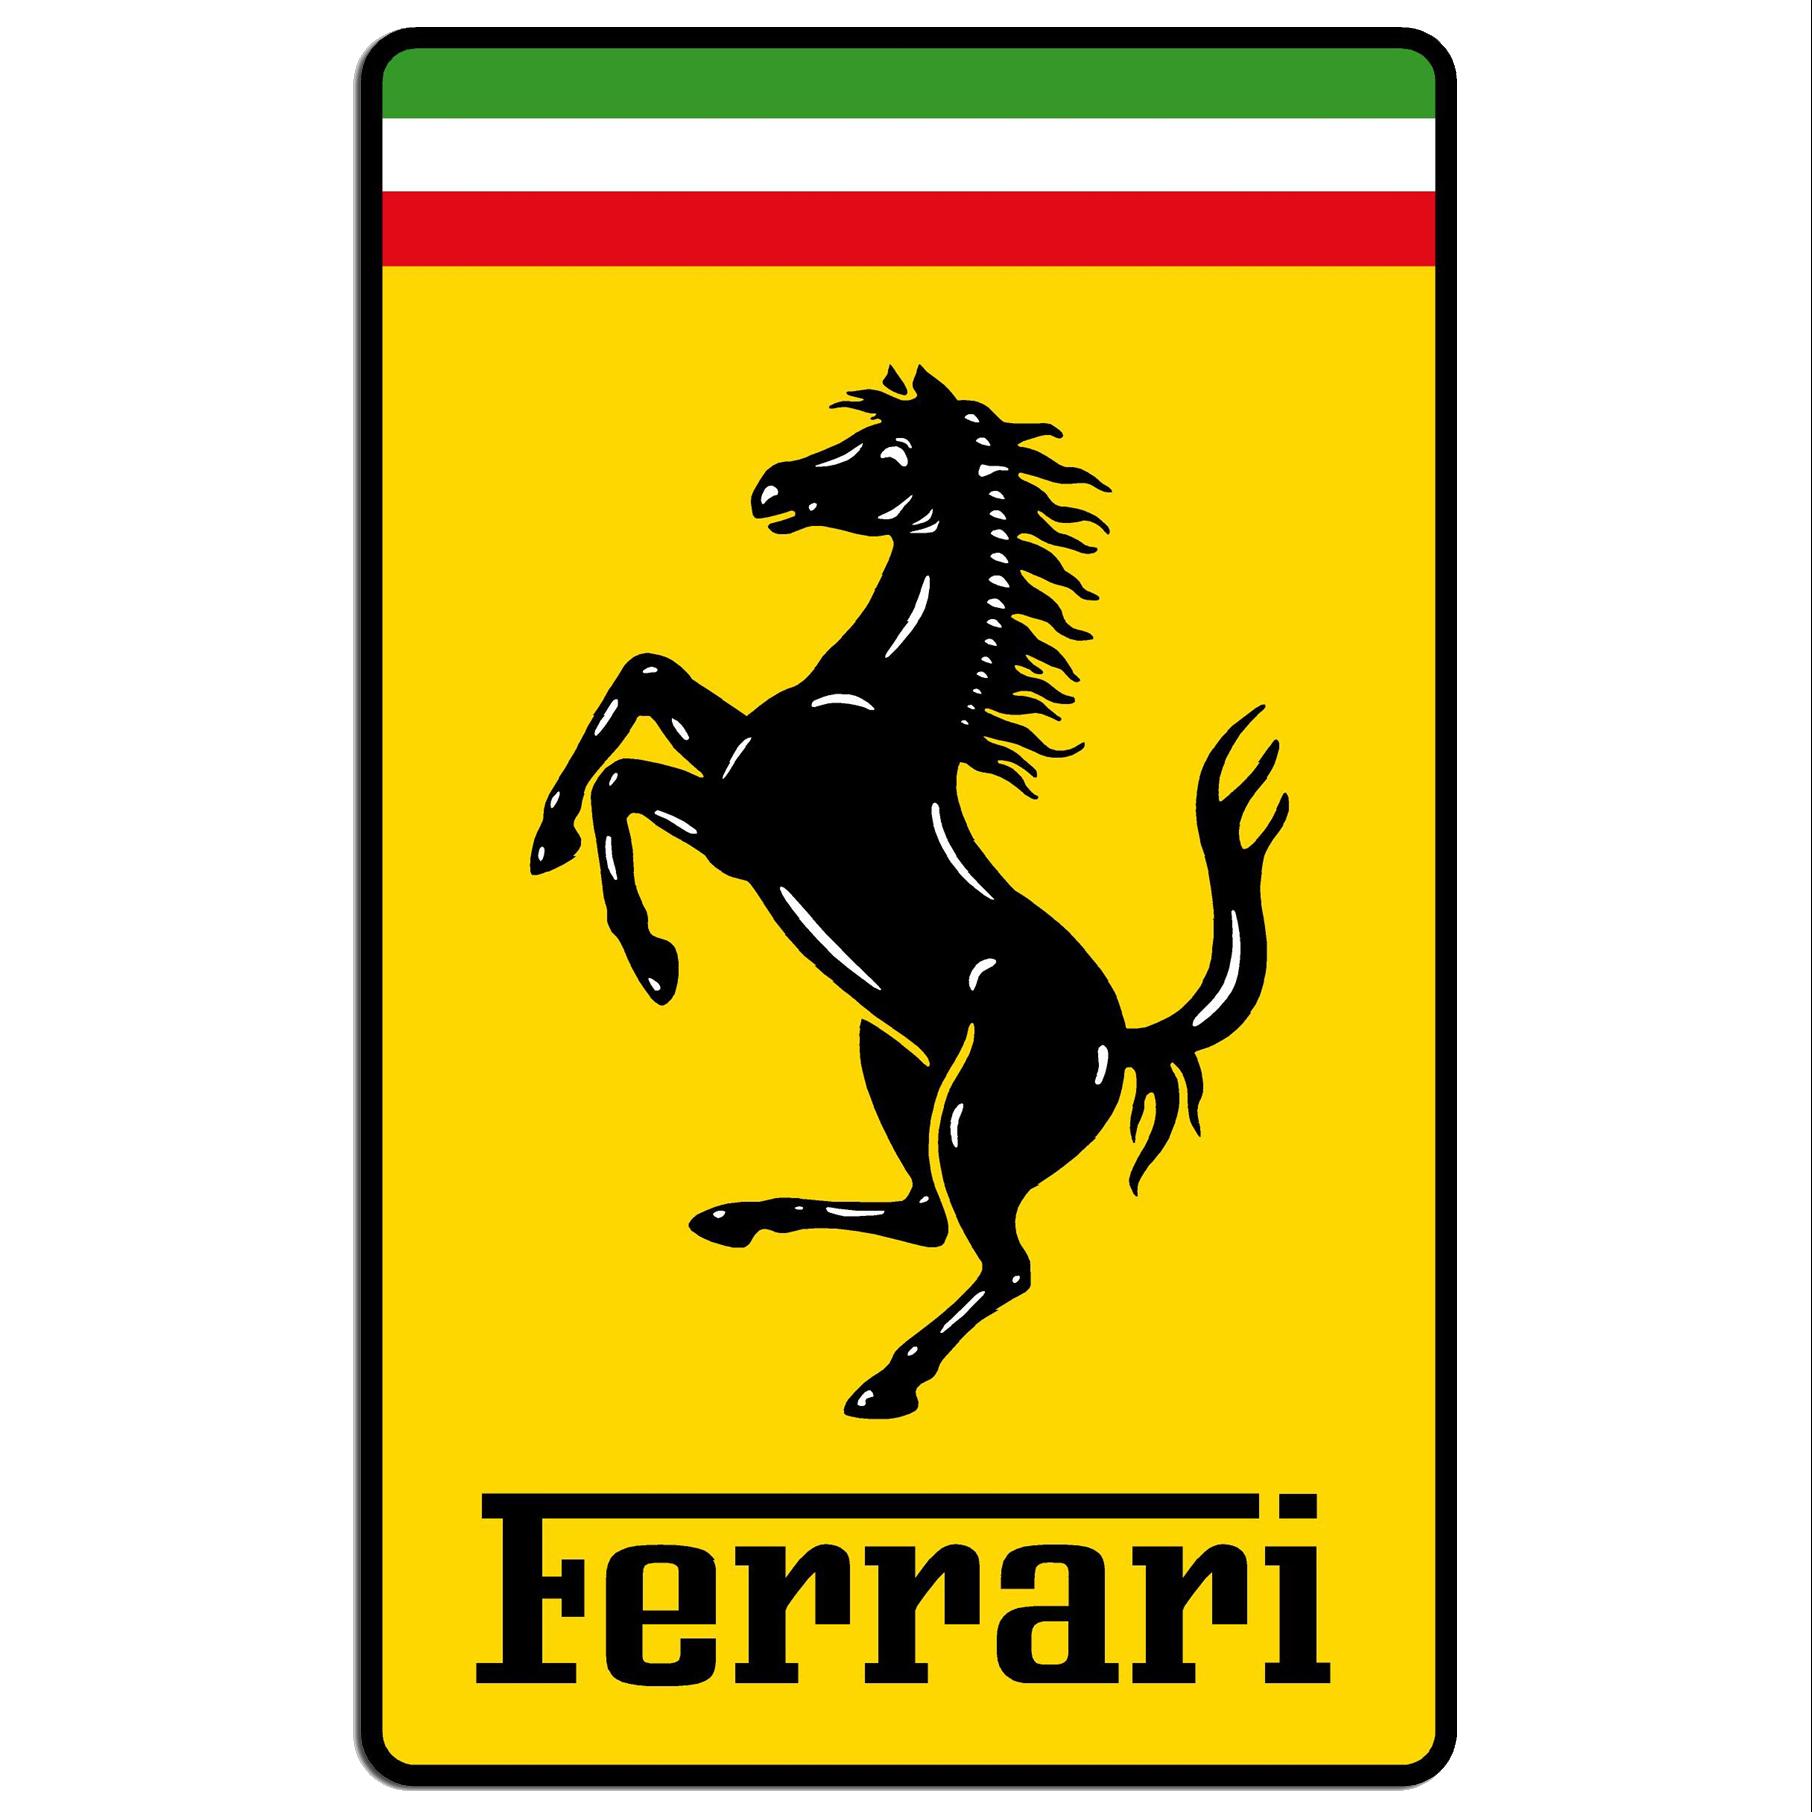 Ferrari enzo ferrari for sale classic driver ferrari enzo ferrari 2002 2007 vanachro Image collections